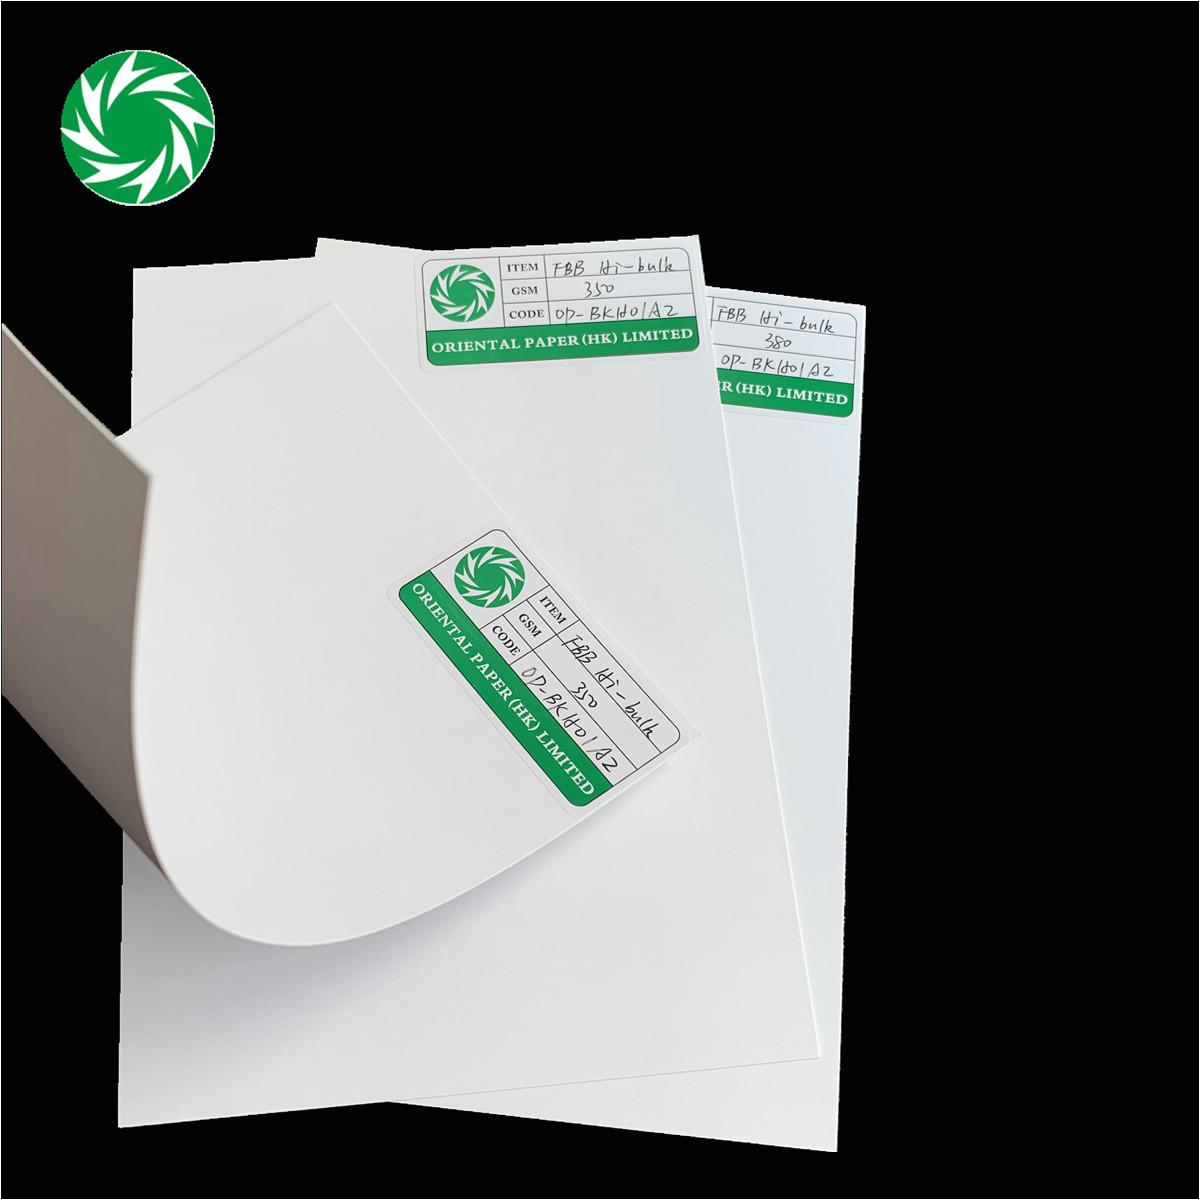 china top brand paper supplier gc1 folding box board jpg